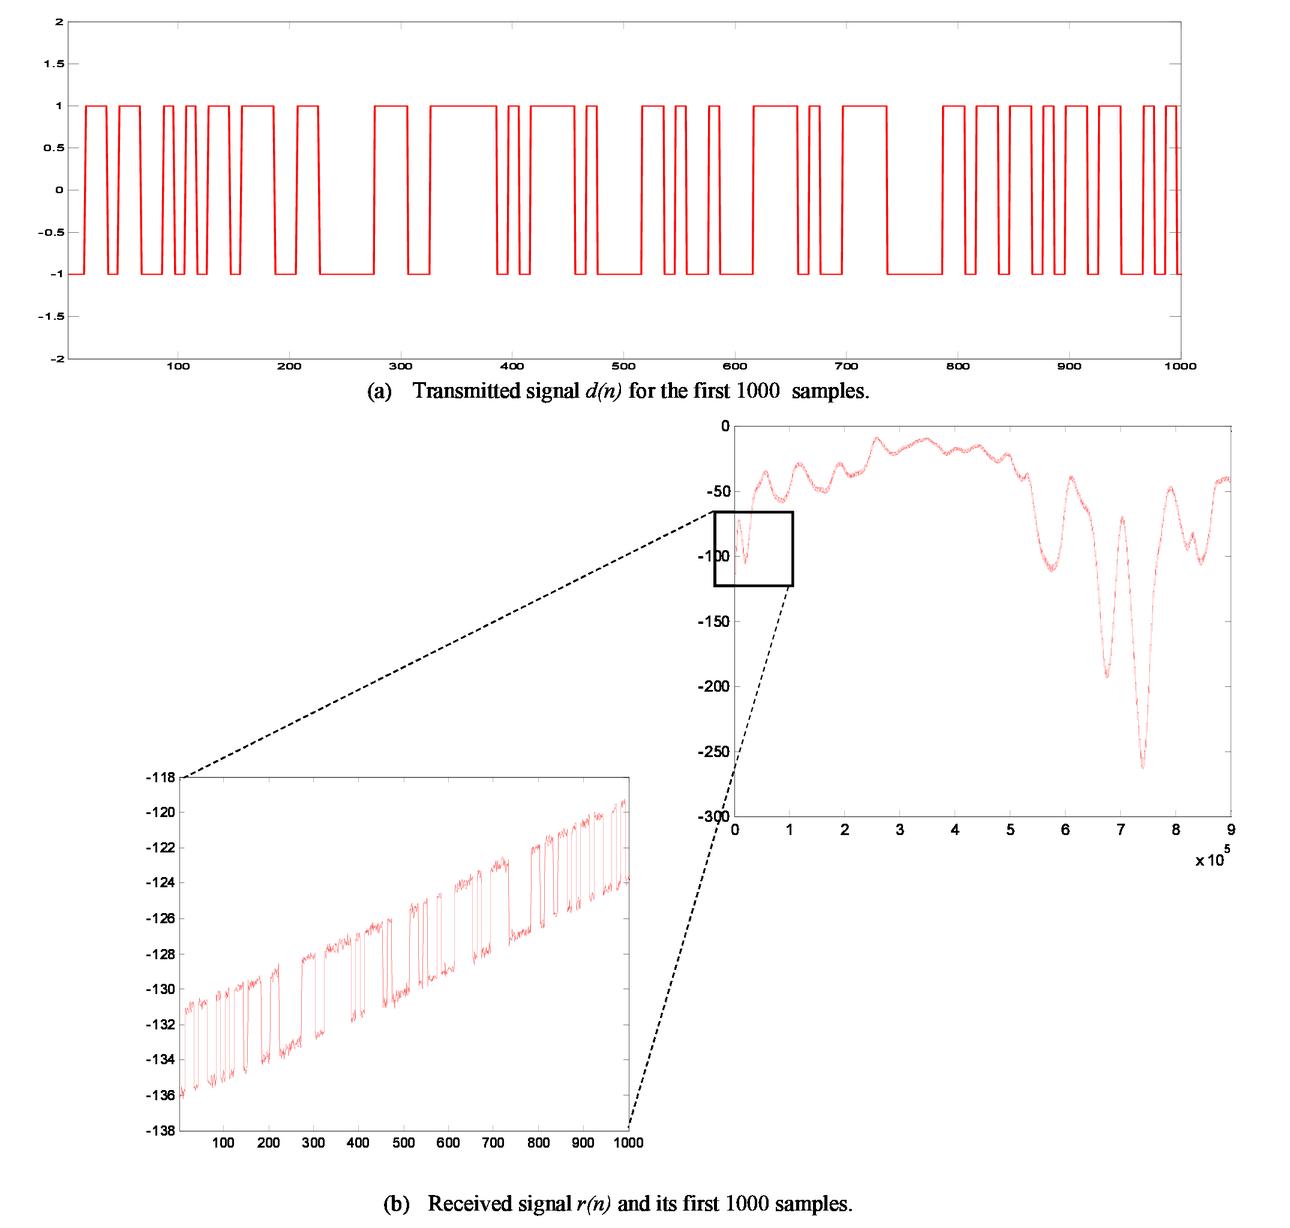 Trading capital binary options strategies pdf free